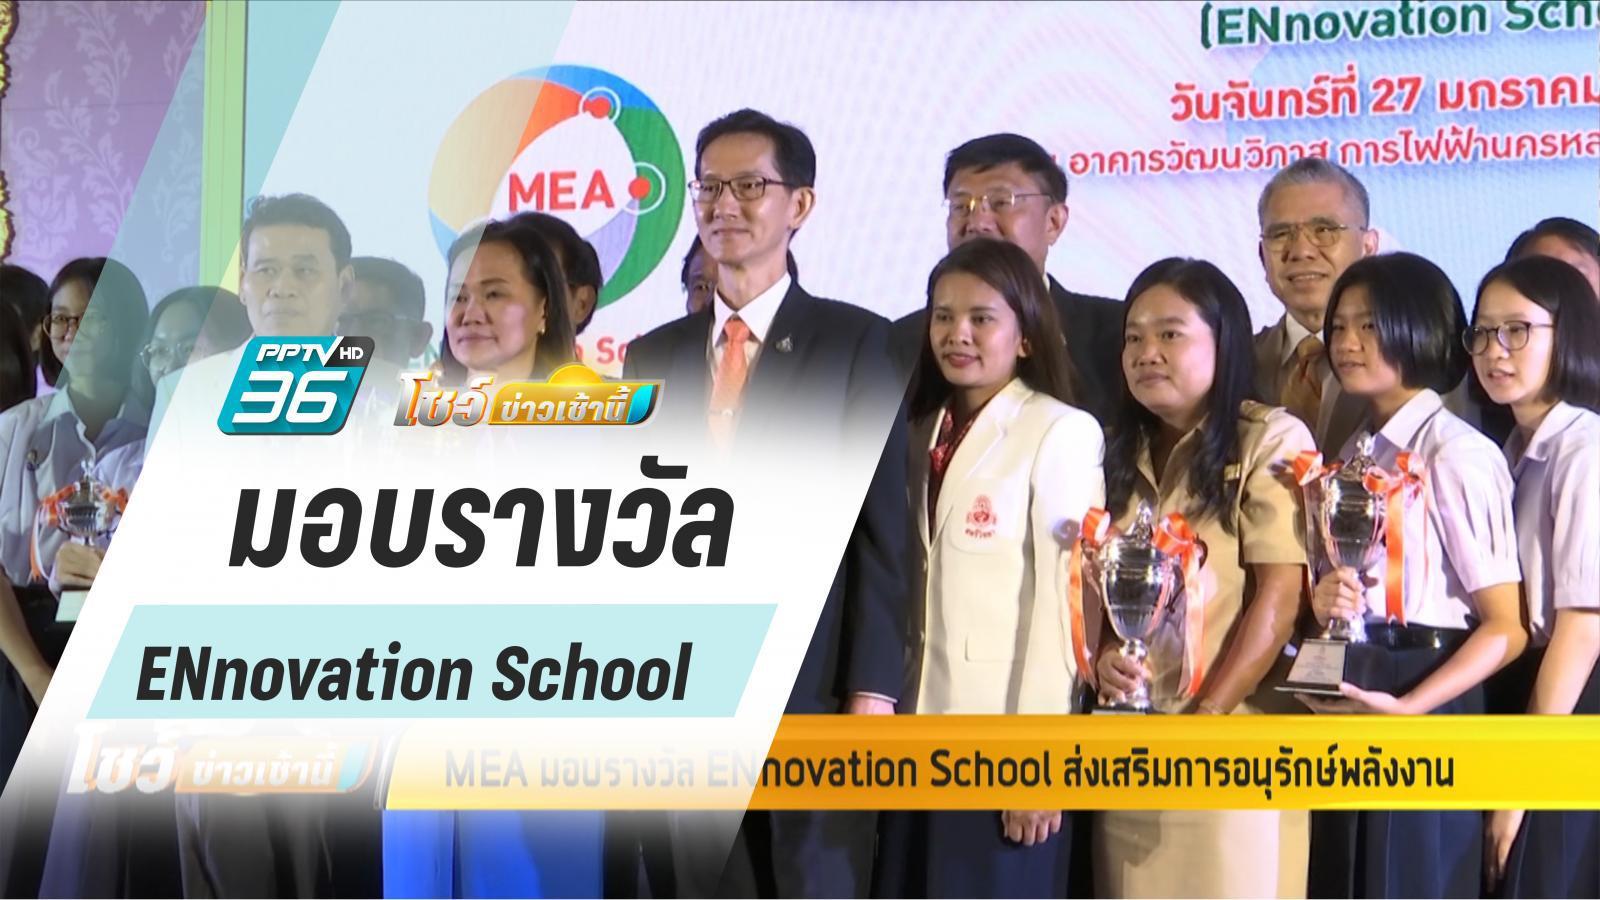 MEA มอบรางวัล ENnovation School ส่งเสริมการอนุรักษ์พลังงาน